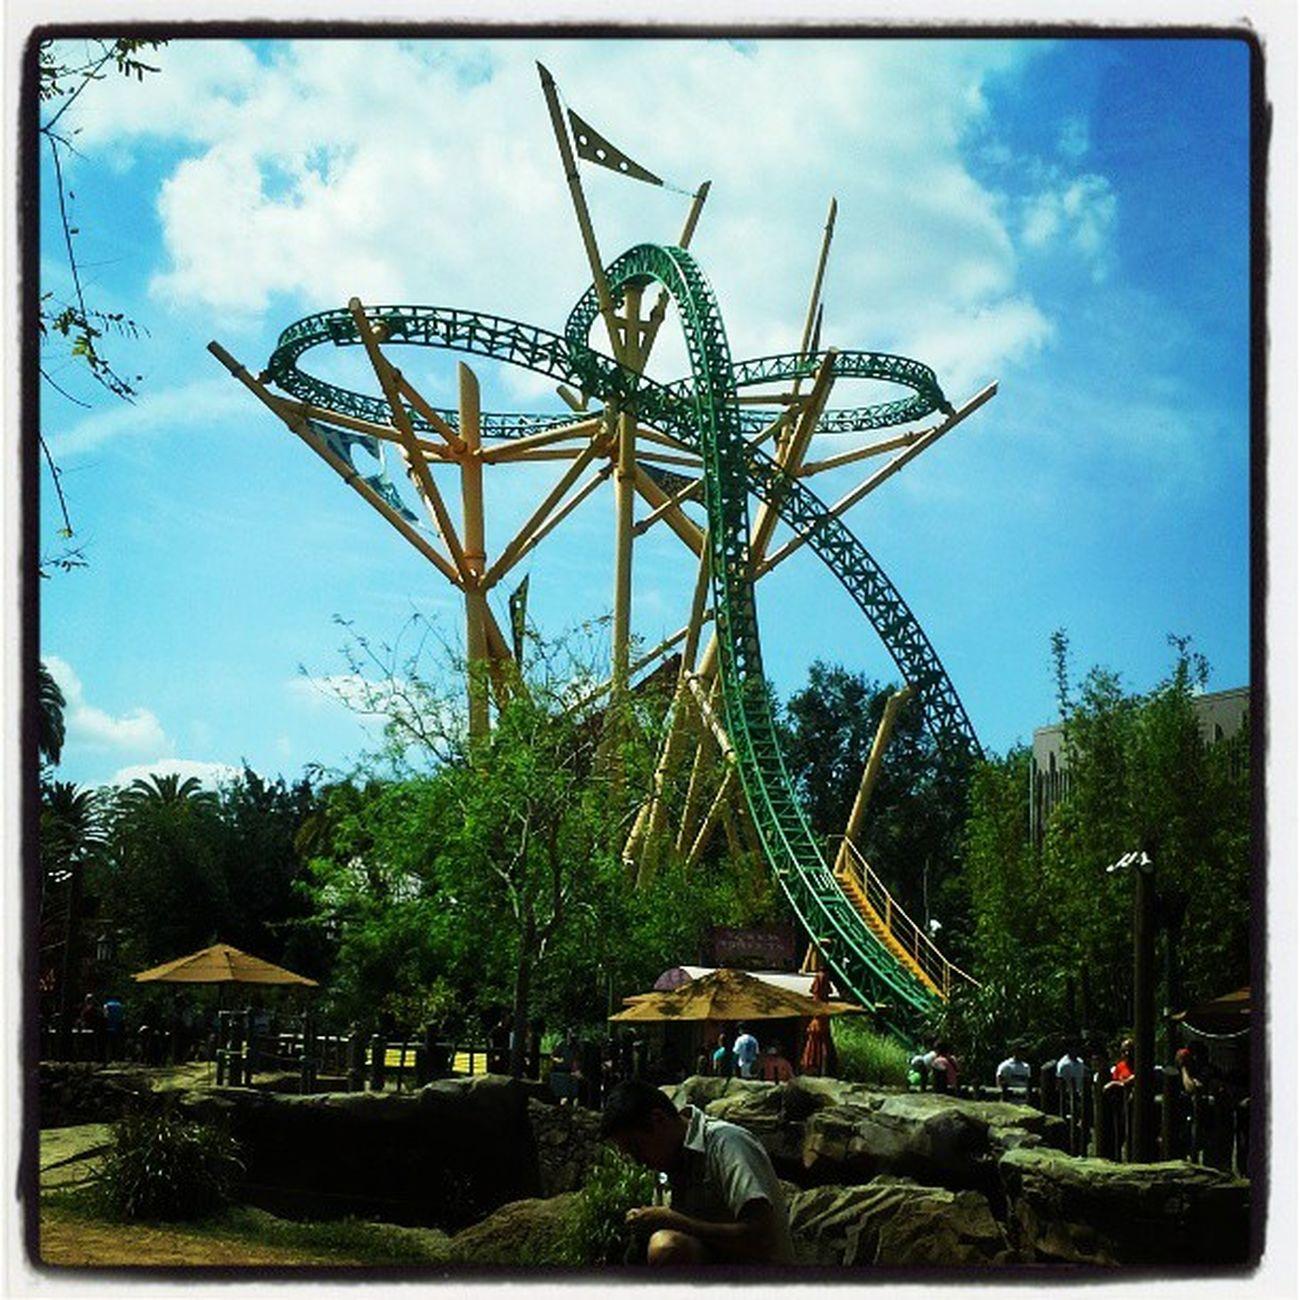 Tourist Florida Coaster Rollercoaster Busch Pixoddinary Pixoddinary_c6